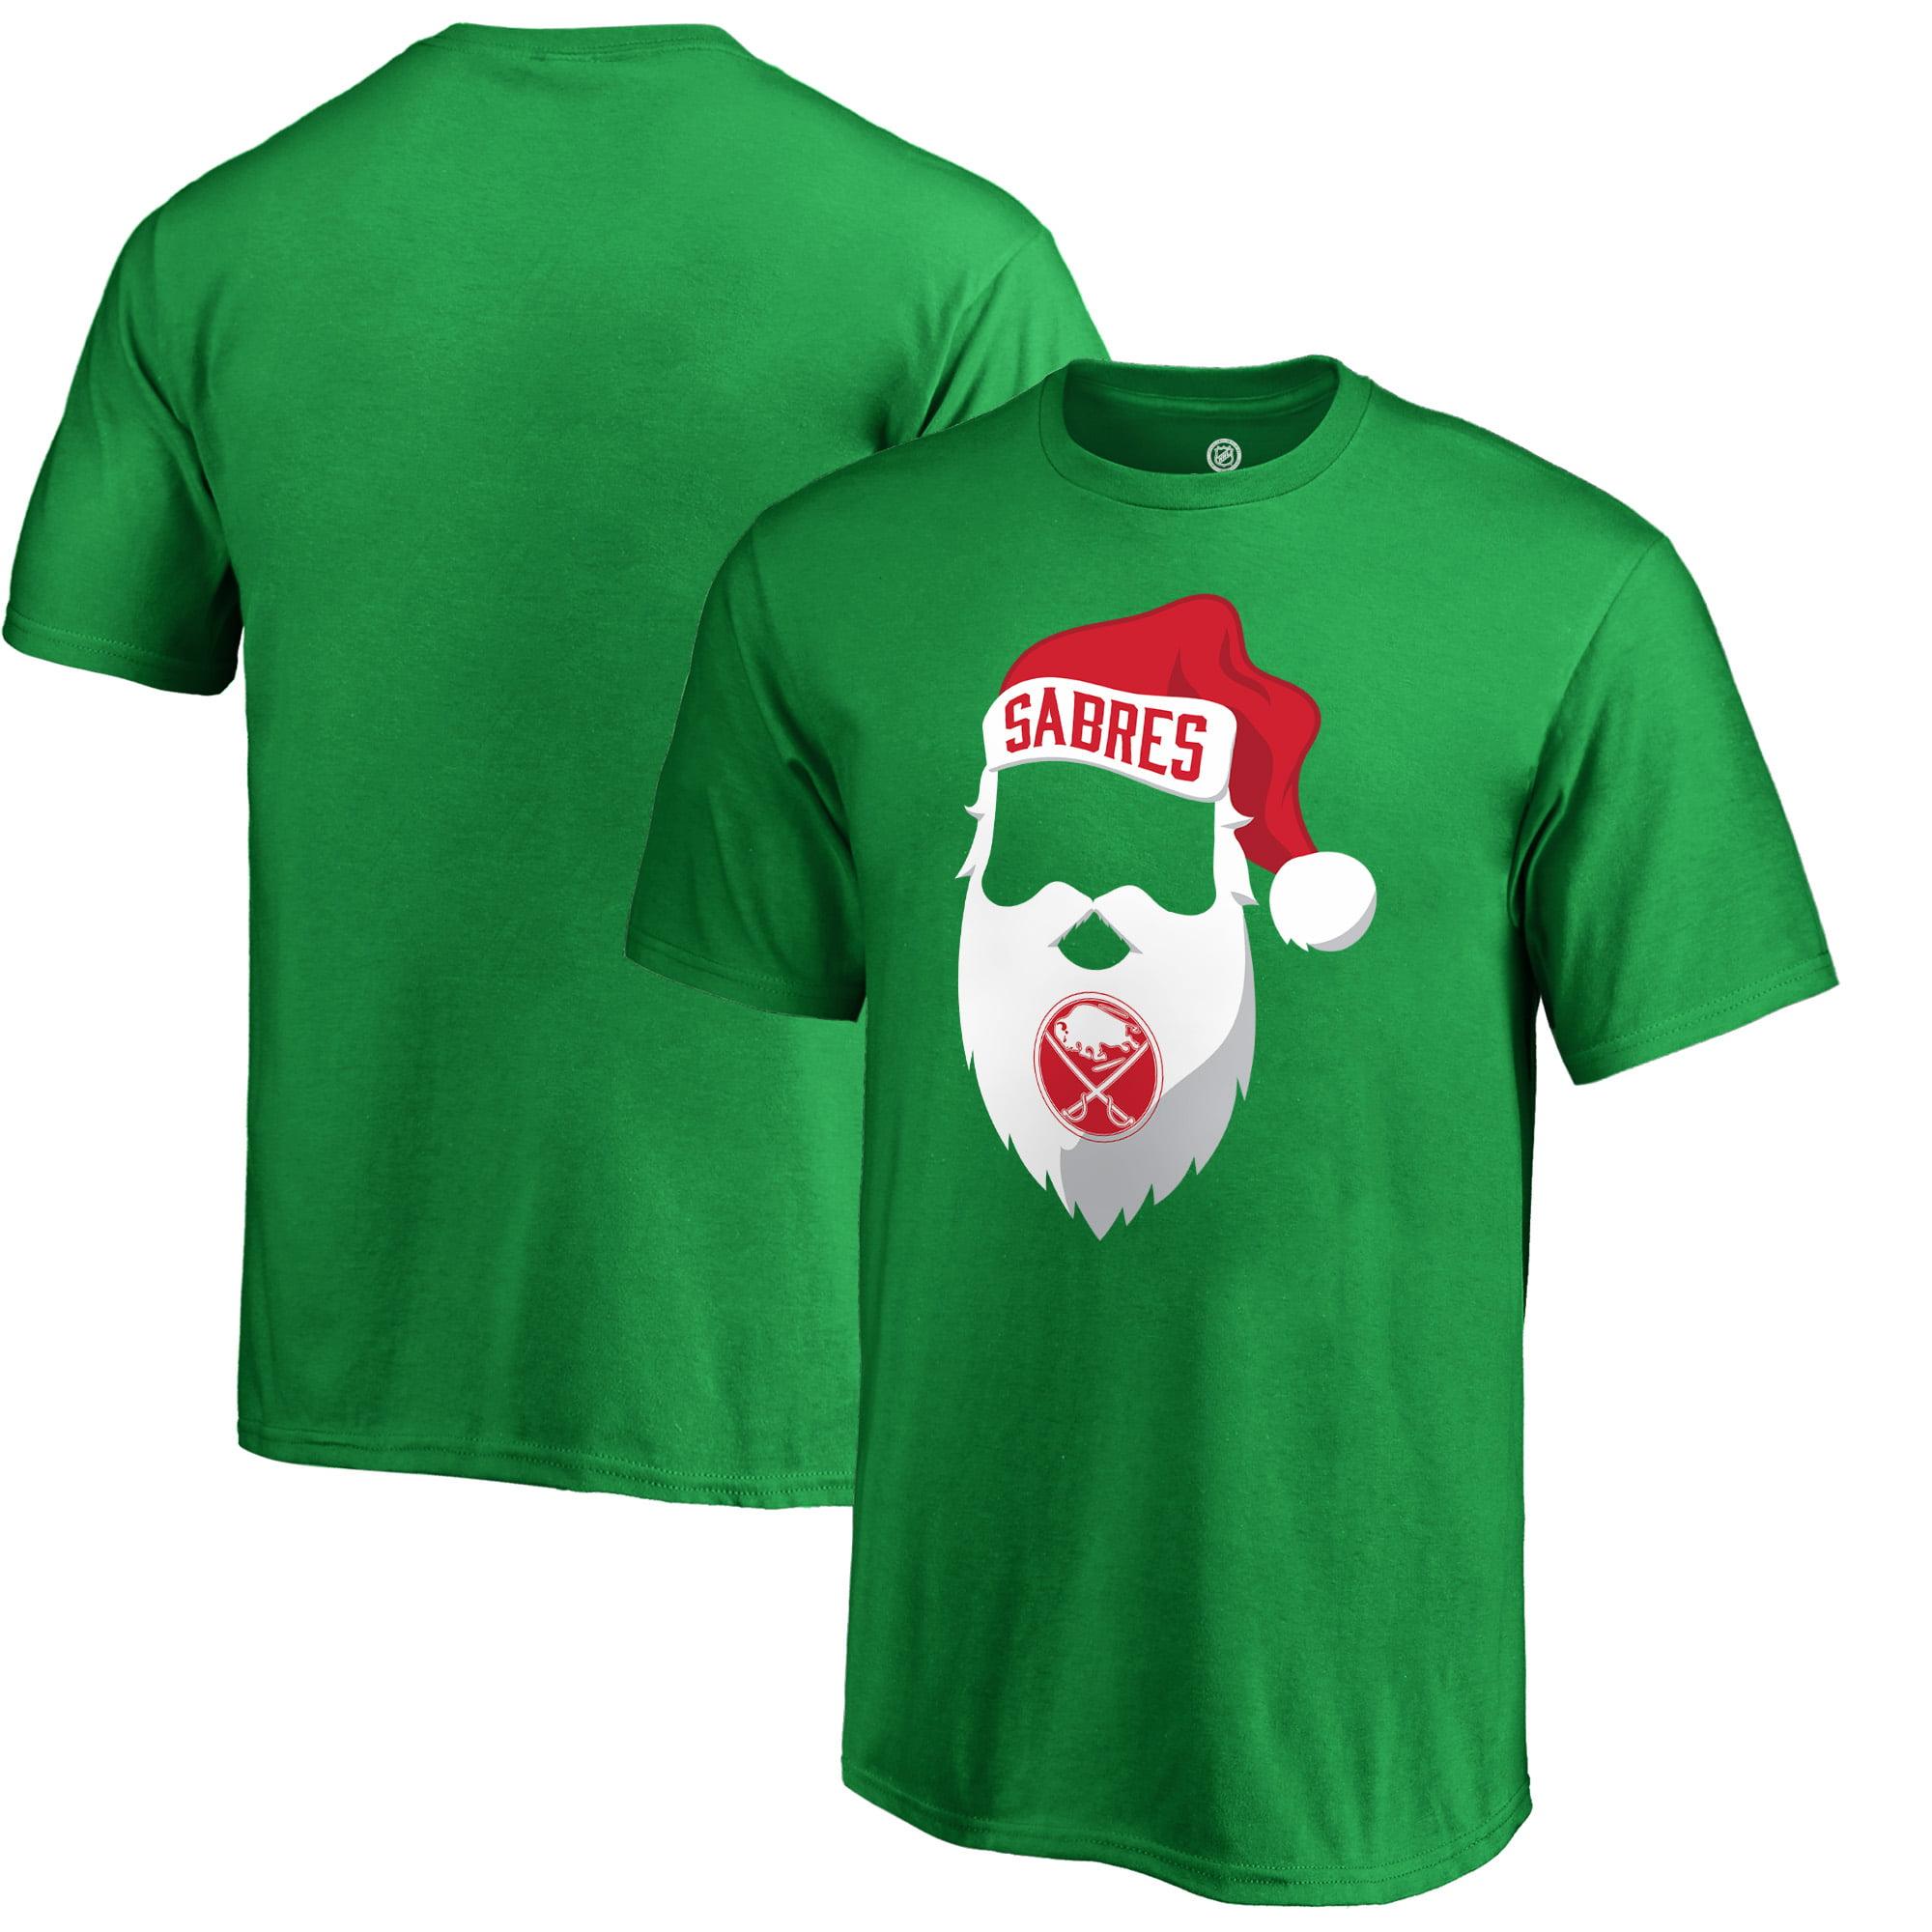 Buffalo Sabres Fanatics Branded Youth Jolly T-Shirt - Kelly Green